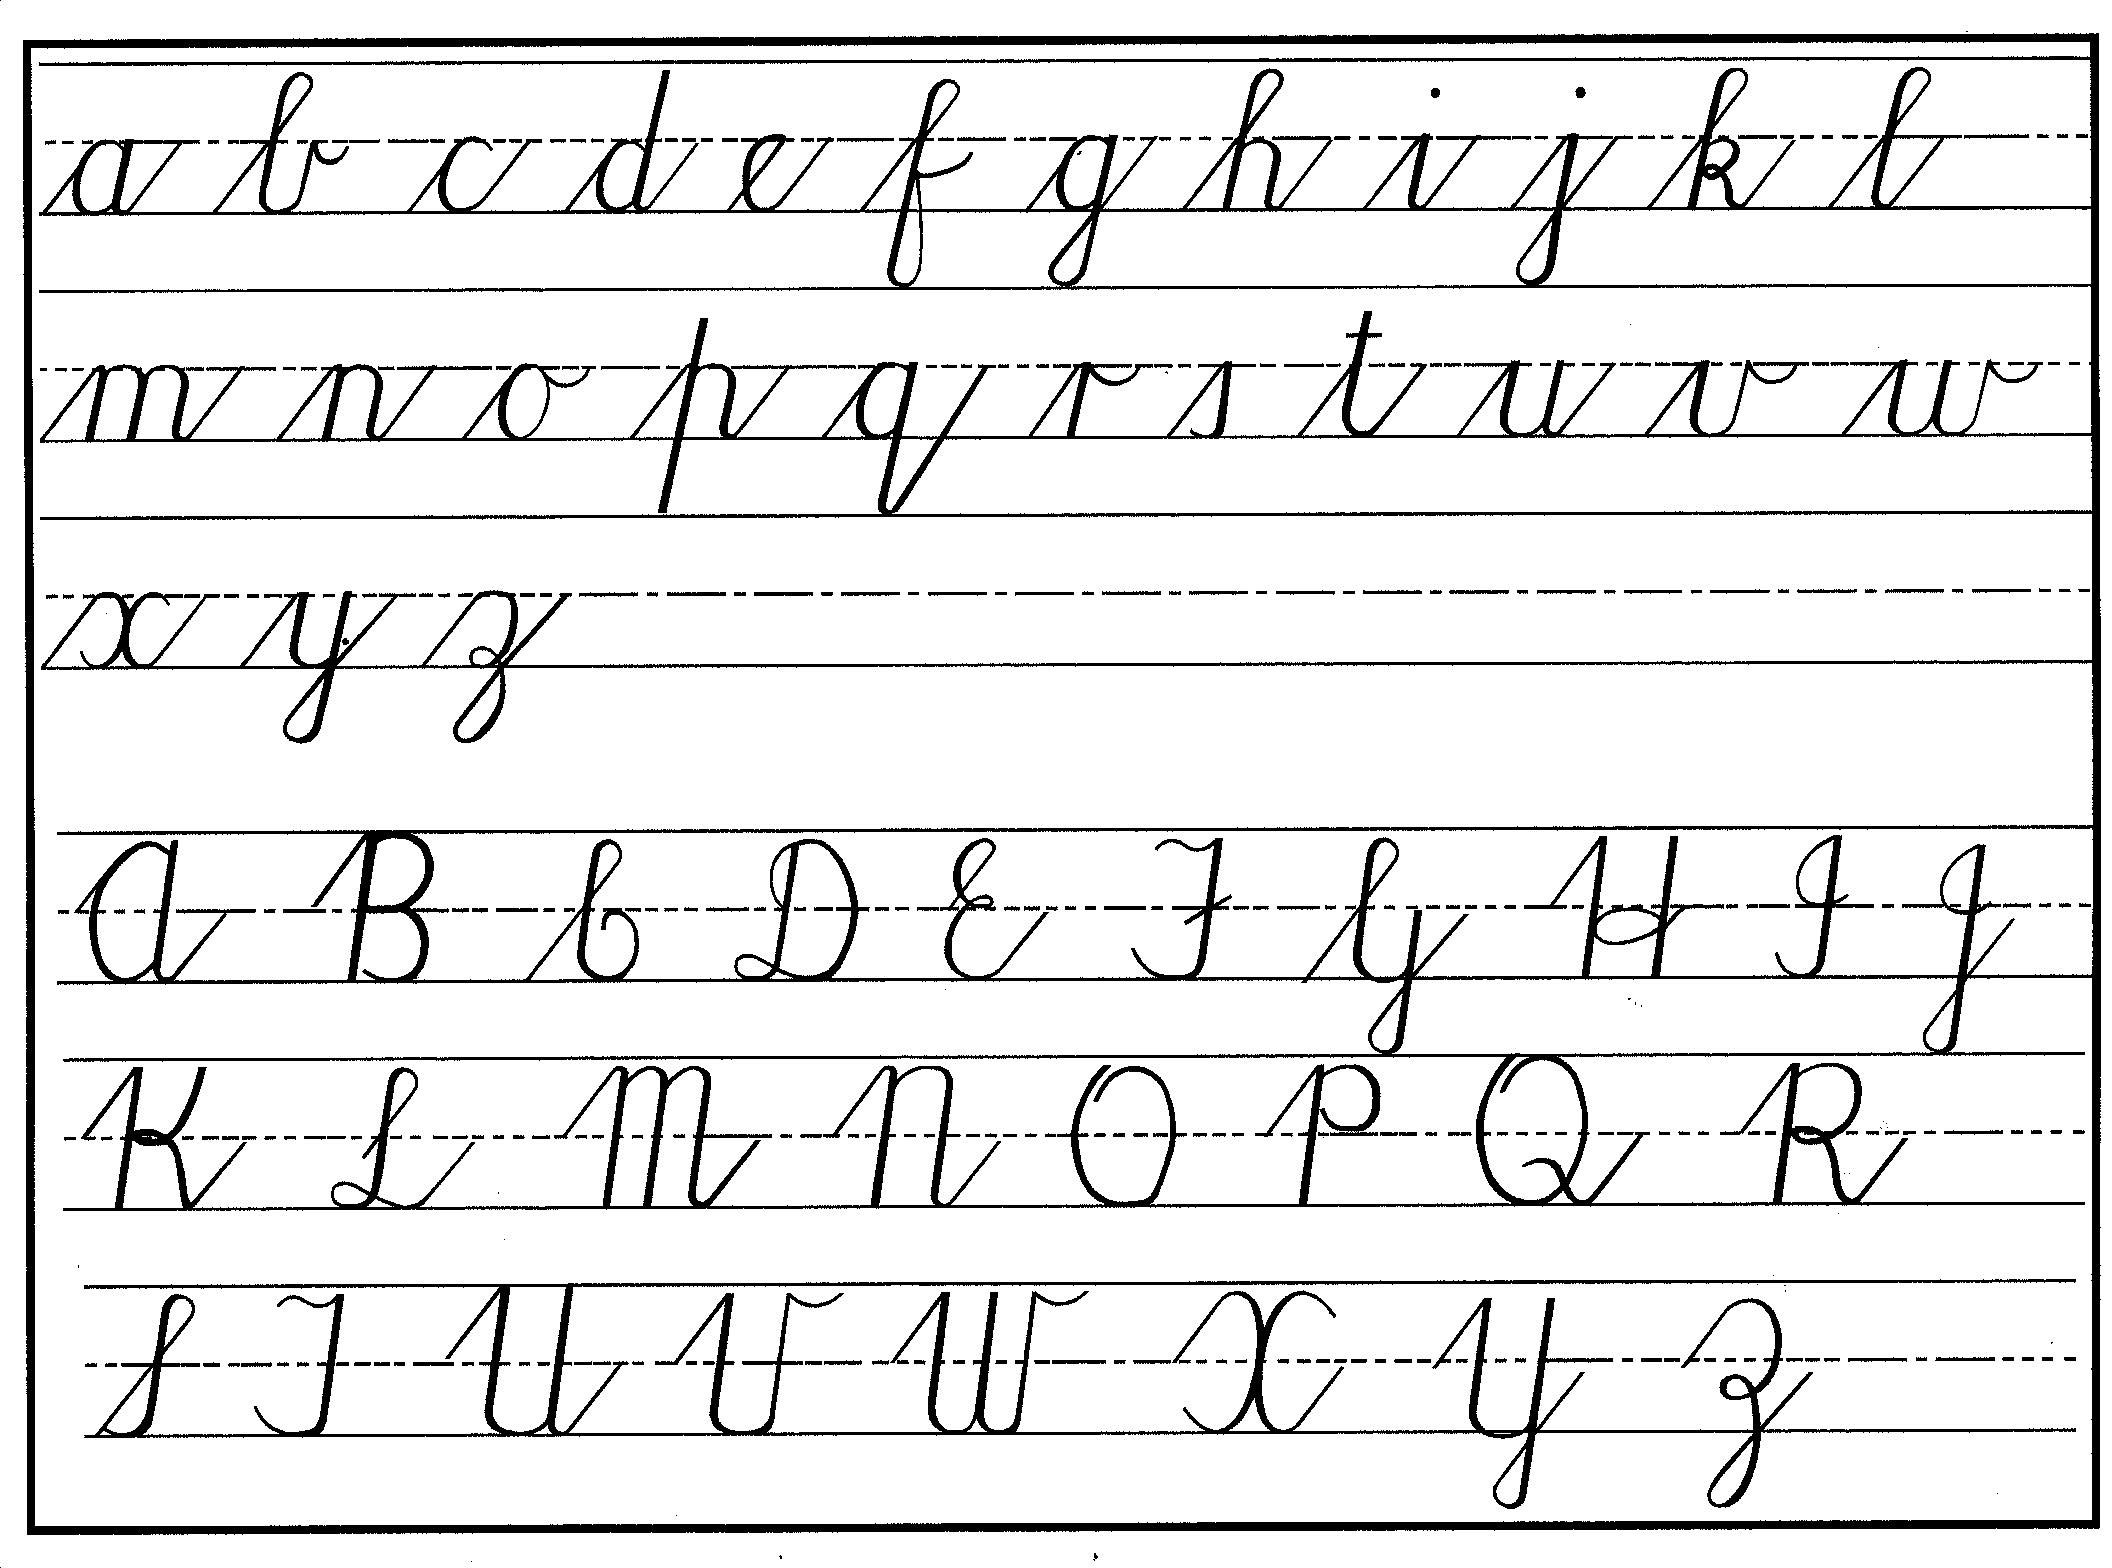 http://practicalpages.files.wordpress.com/23/23/cursive